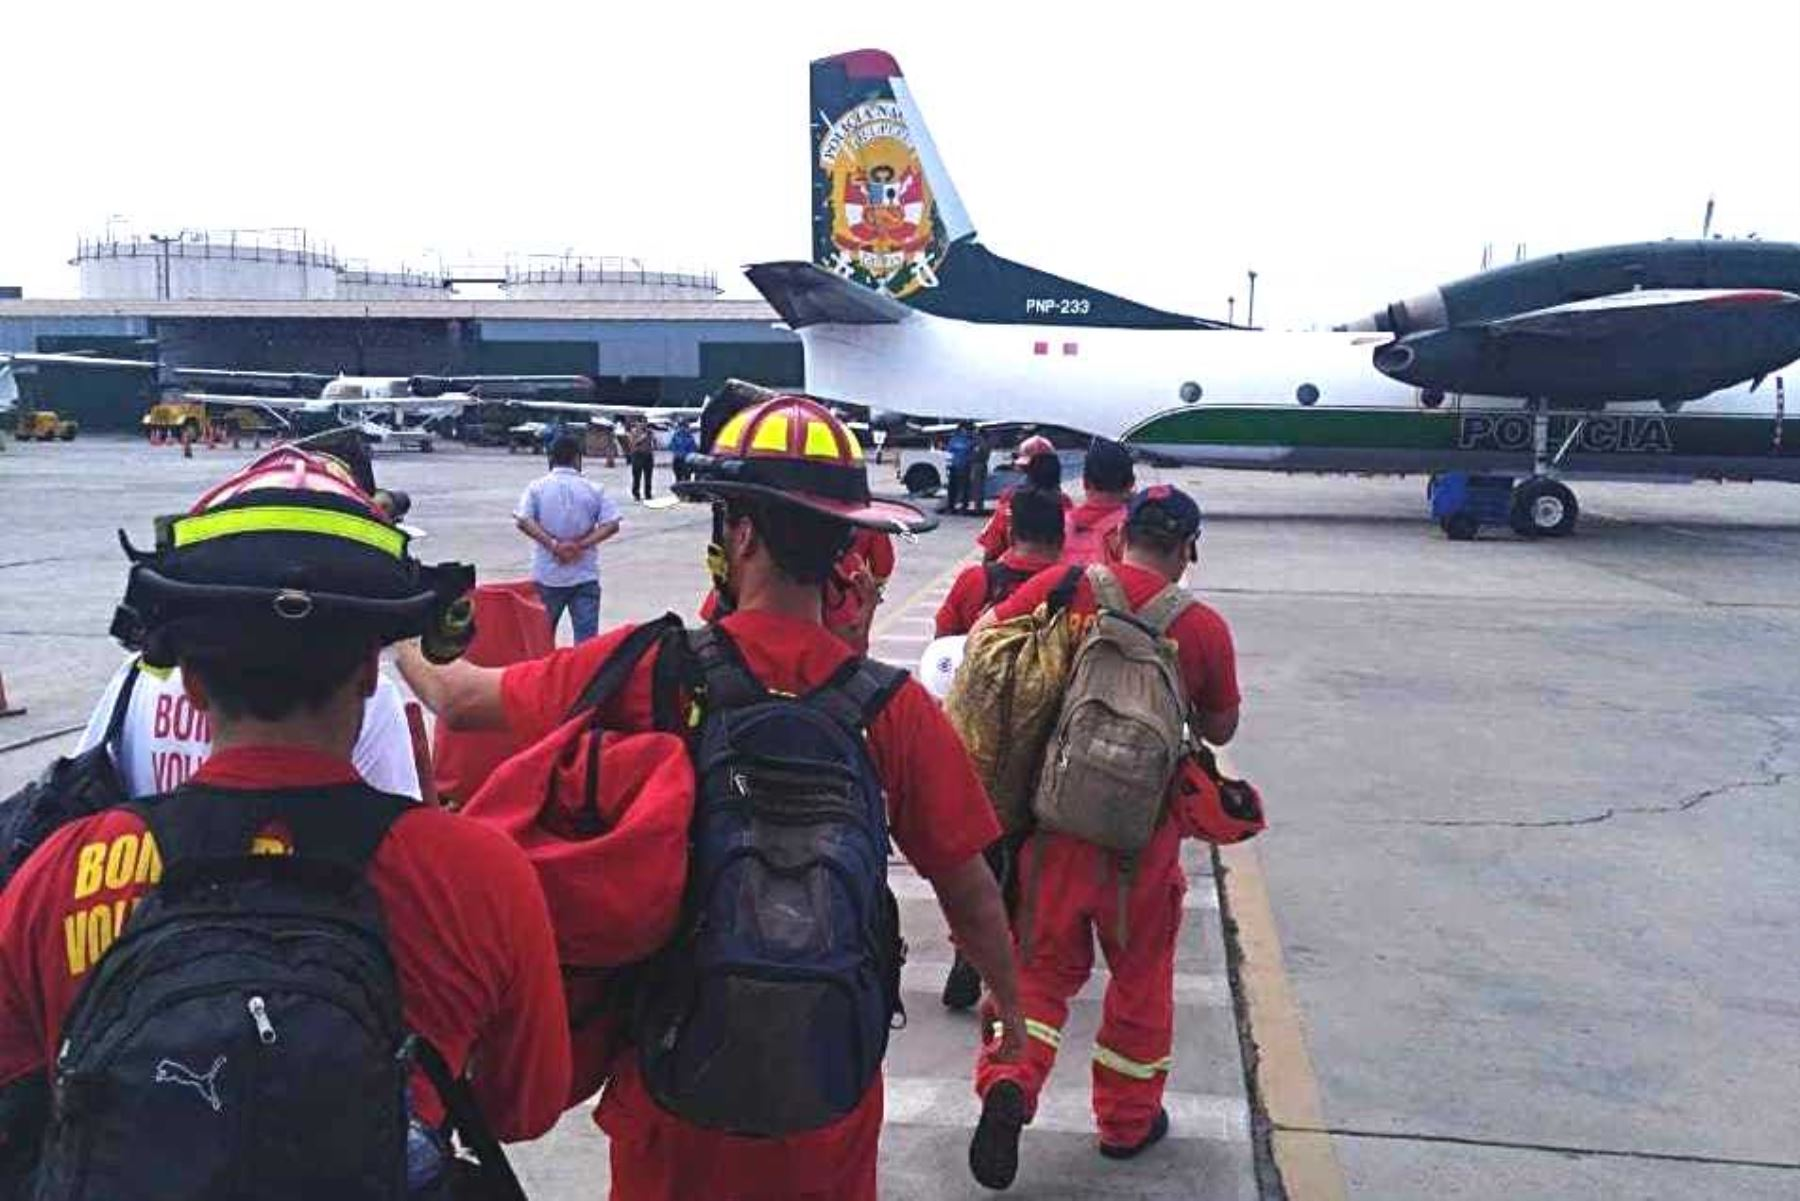 Bomberos voluntarios de Lima viajaron a Moquegua para labores de salvataje. Foto: ANDINA/Difusión.